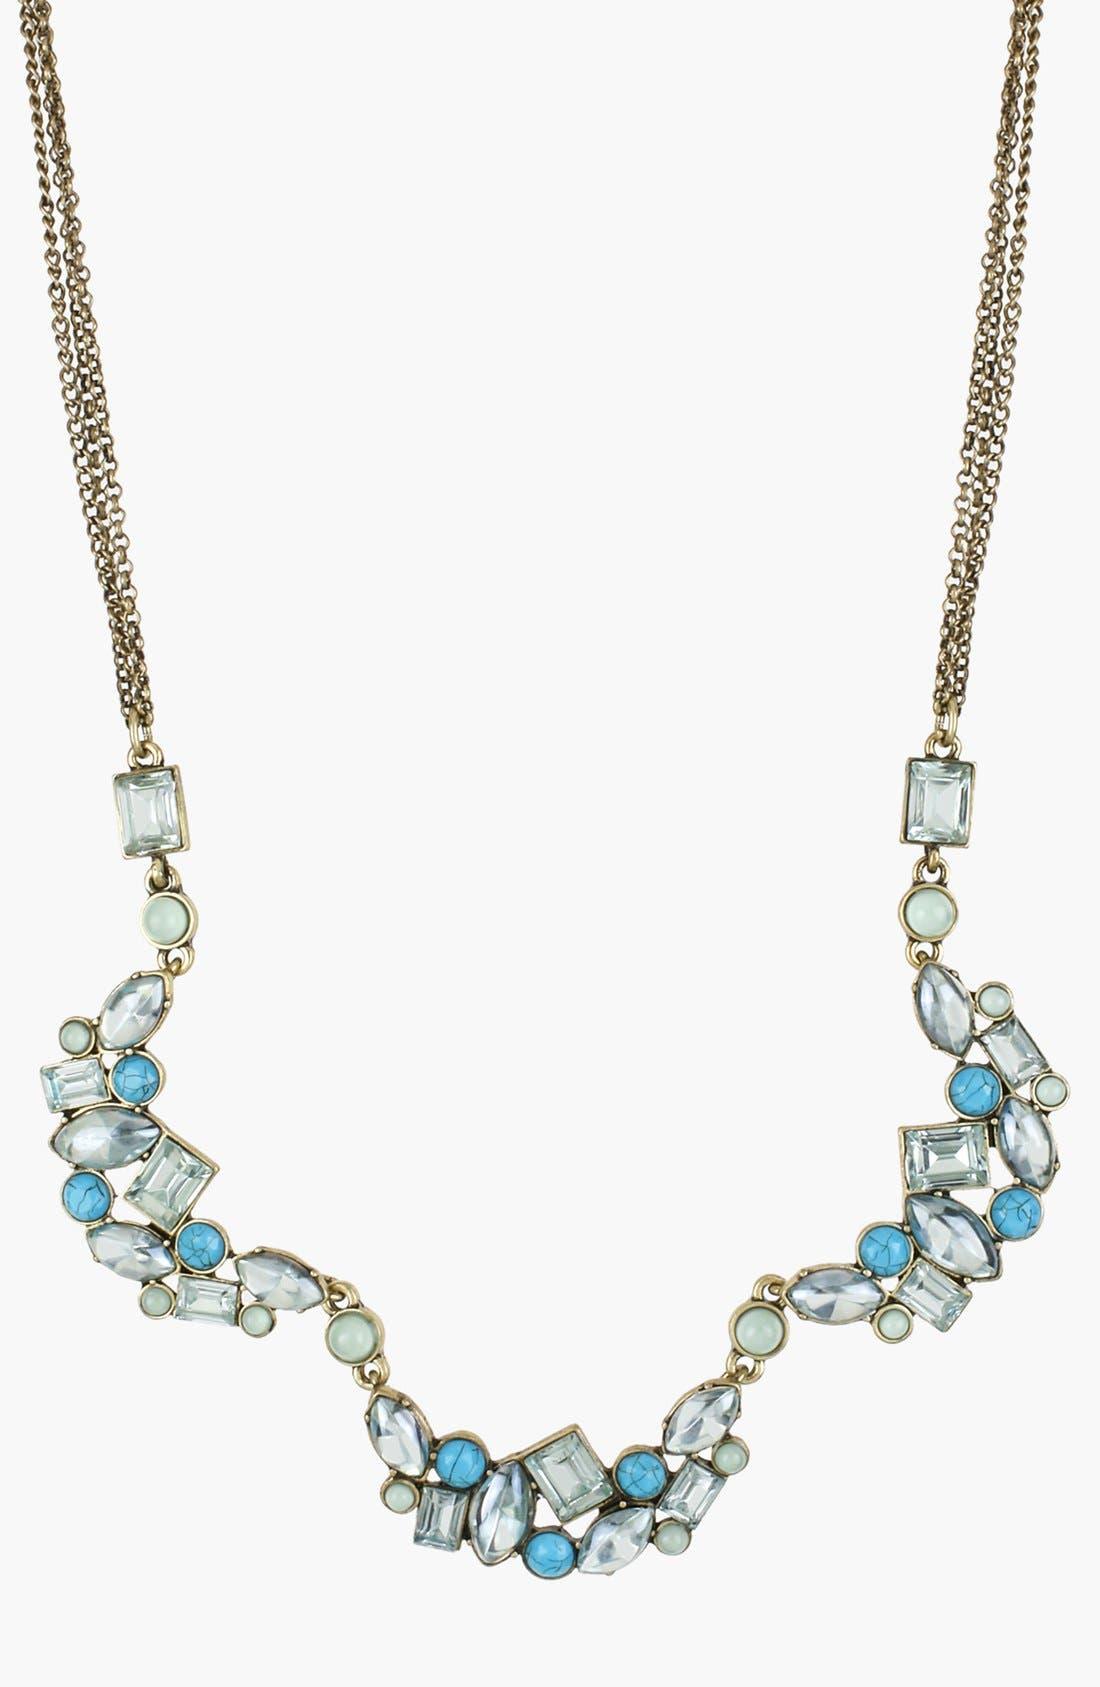 Main Image - Betsey Johnson 'Mint Multi' Frontal Necklace